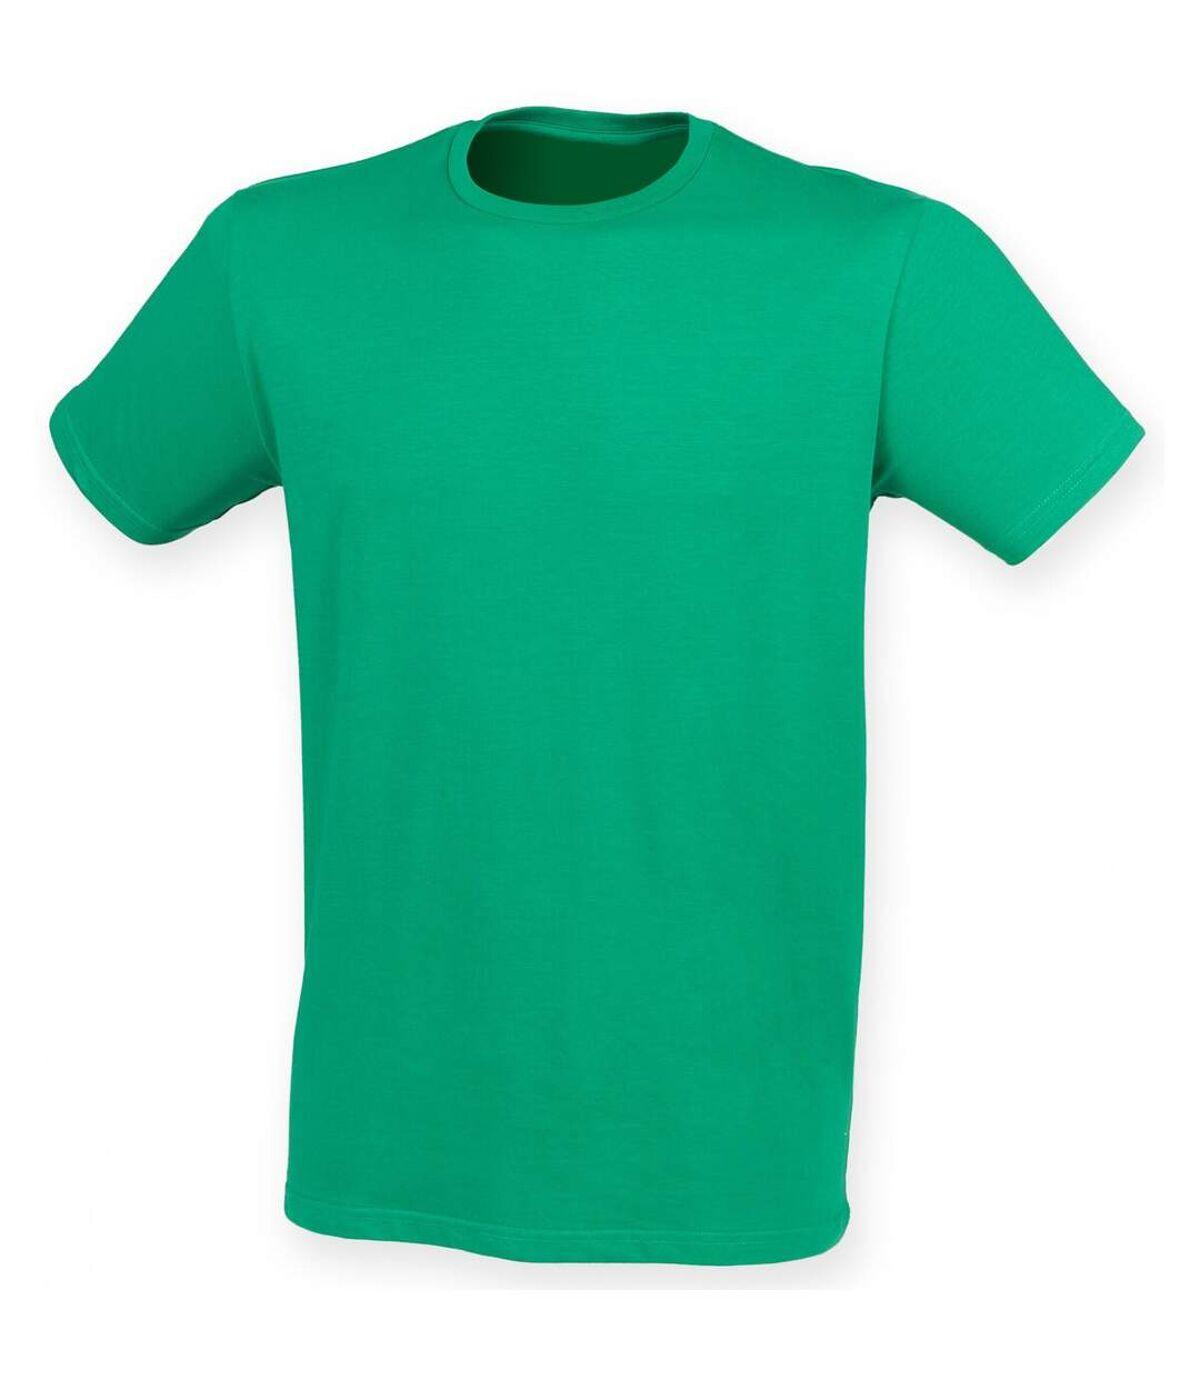 Skinni Fit - T-shirt manches courtes FEEL GOOD - Homme (Vert) - UTRW4427